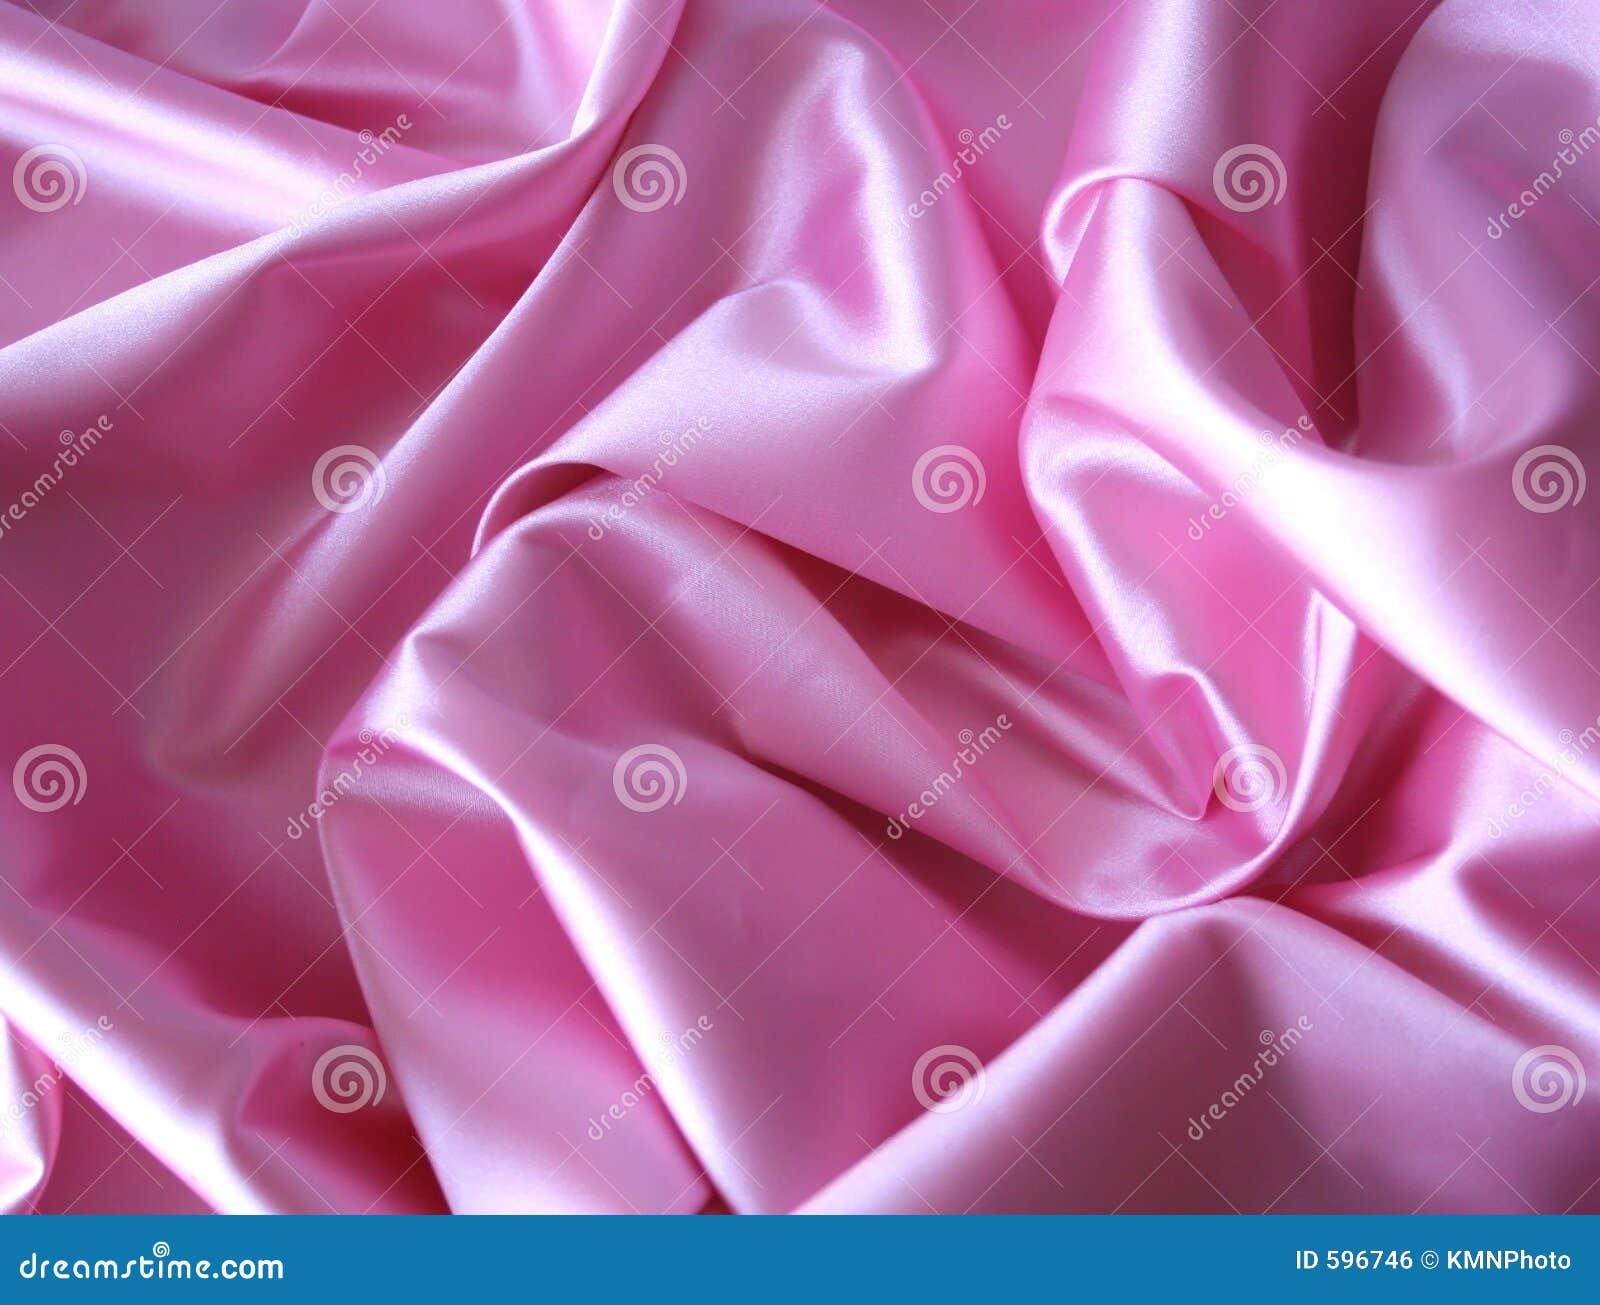 Pink satin background Pink Satin Background